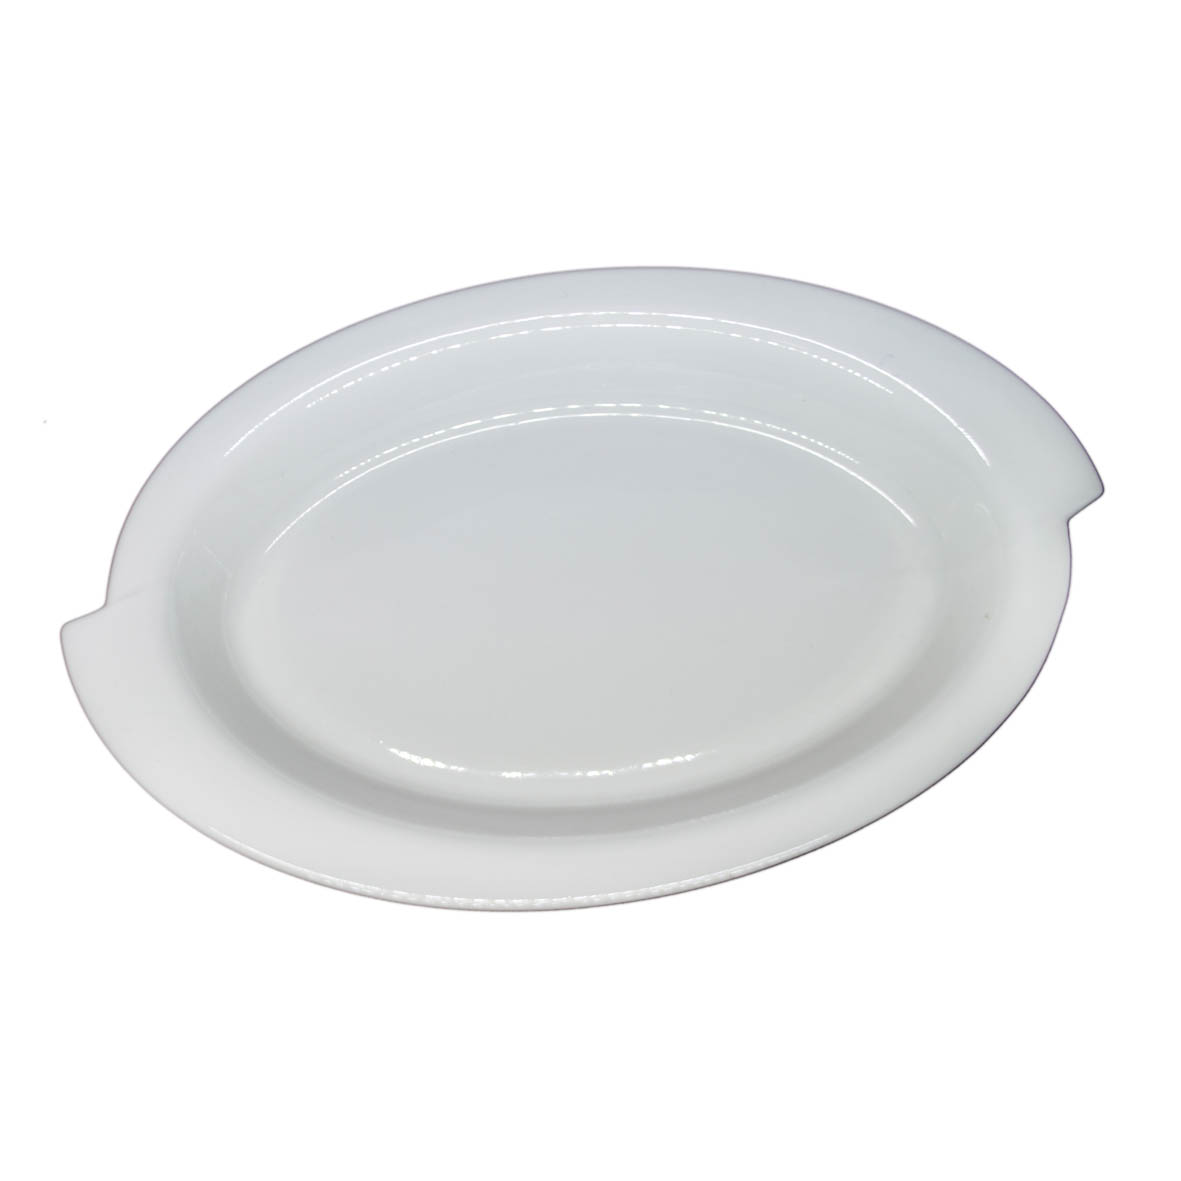 Travessa de Porcelana Oval Borda S 46x25,5x9